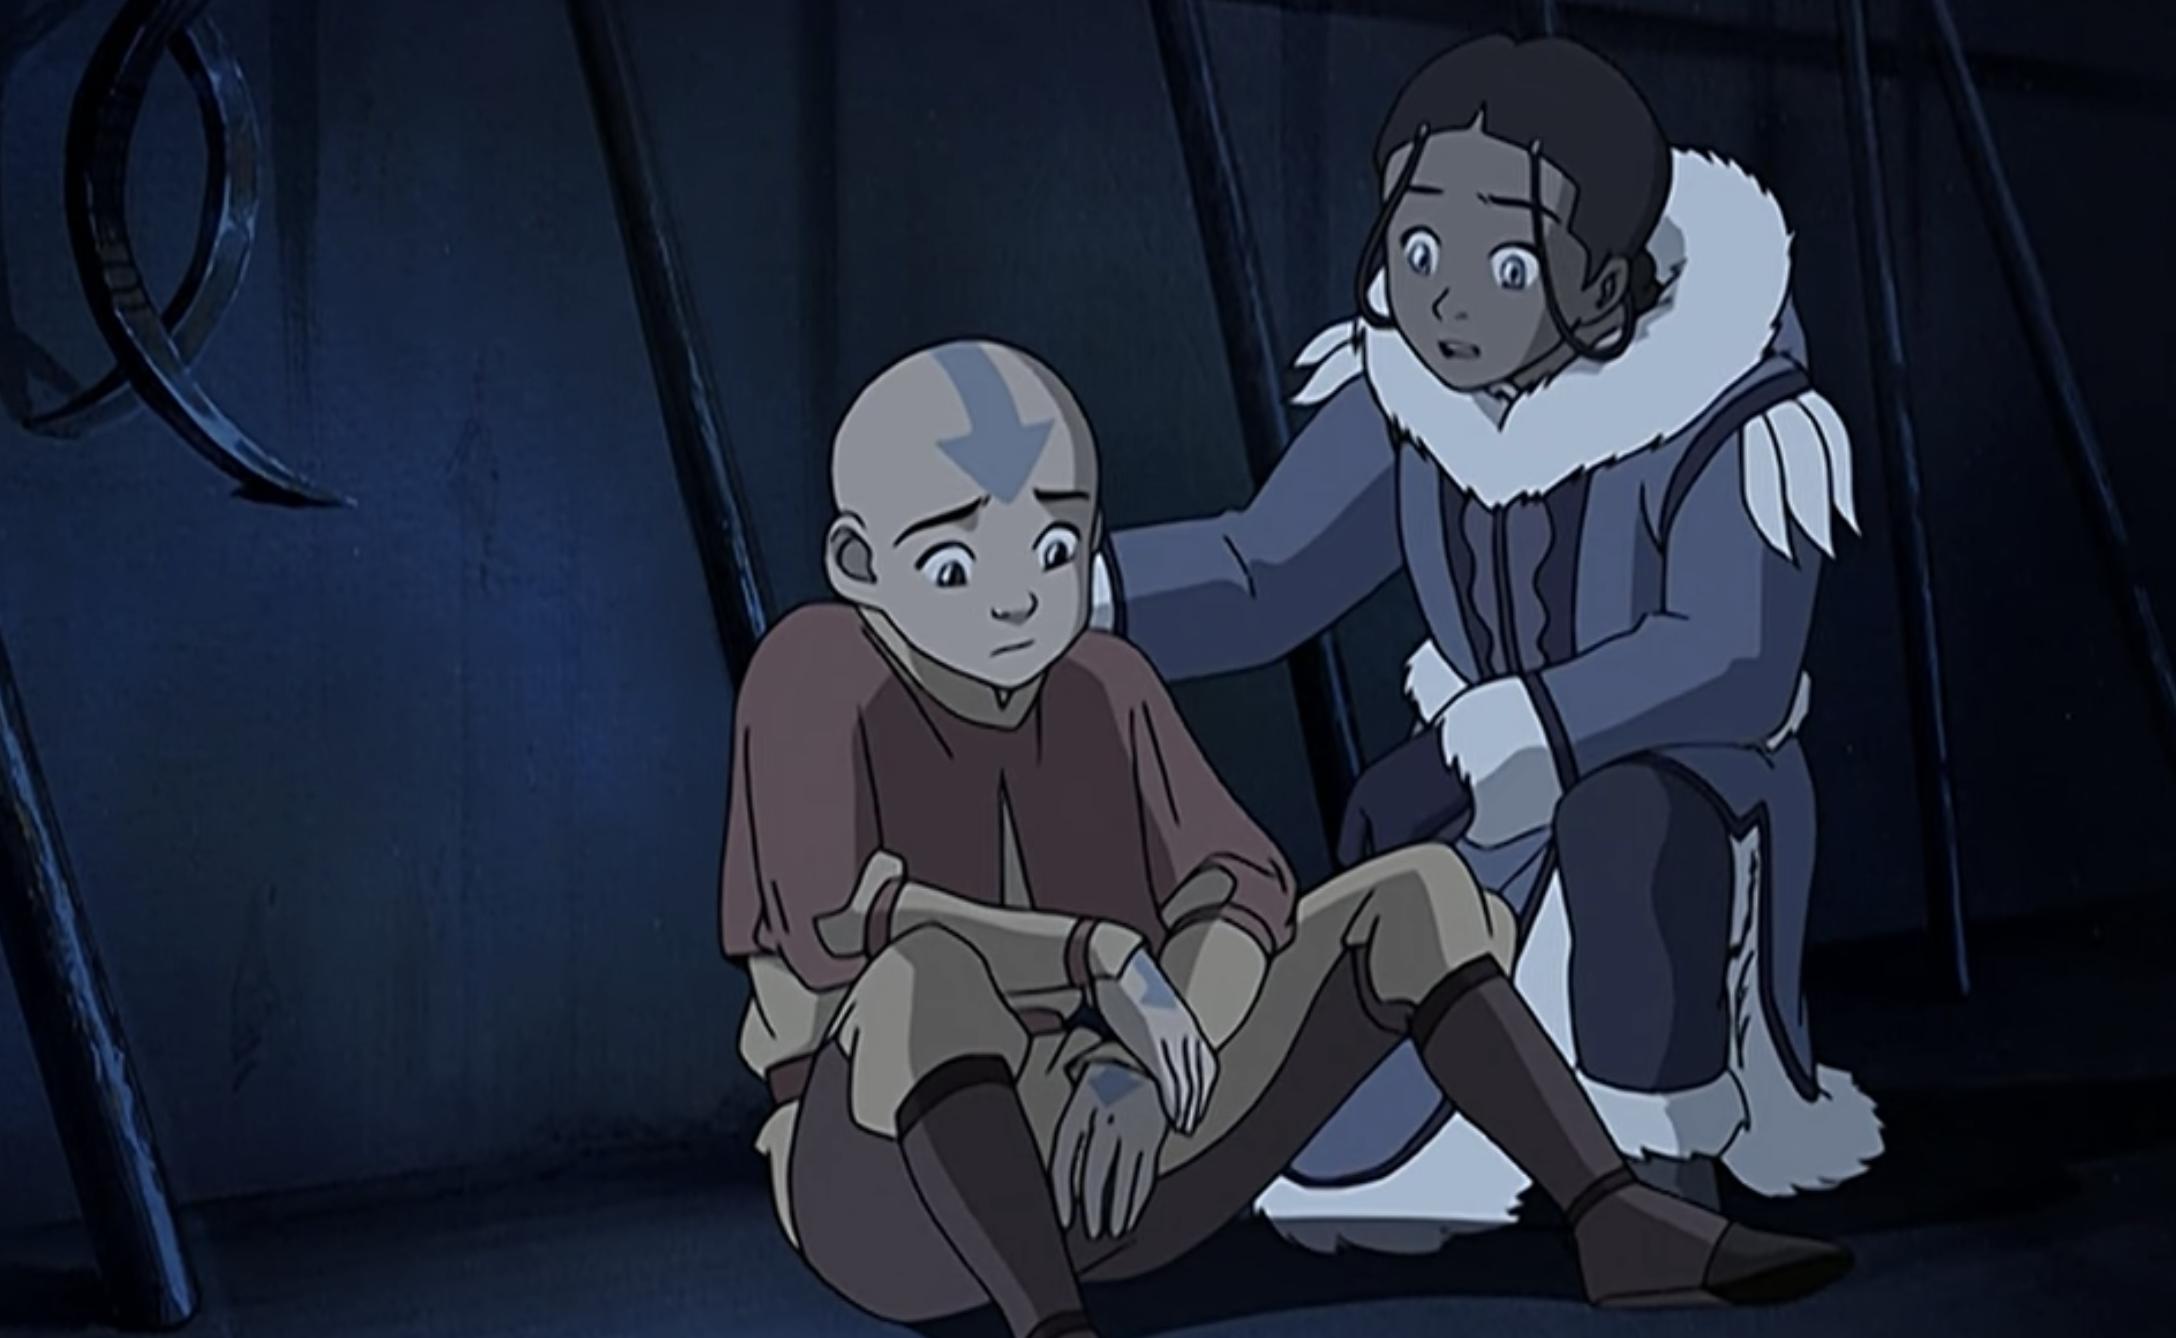 Katara comforting Aang